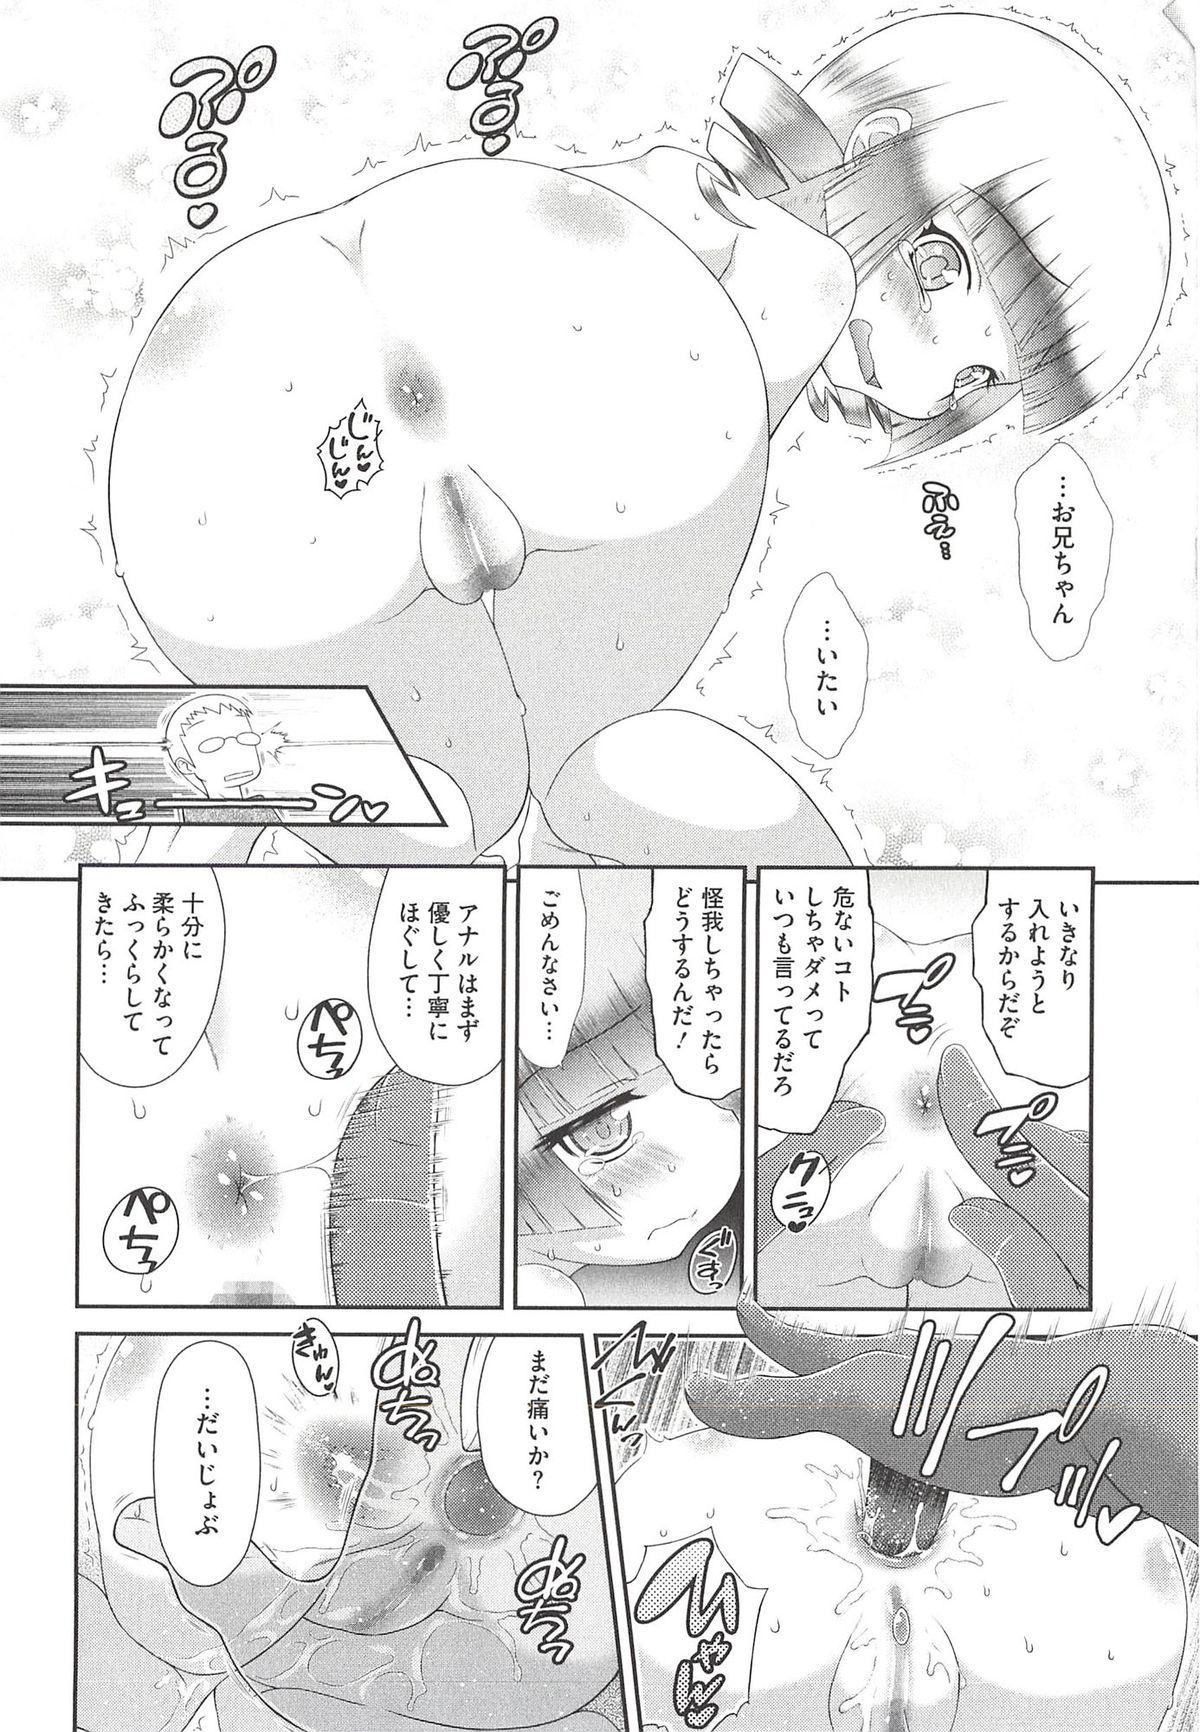 Itazura Time 51